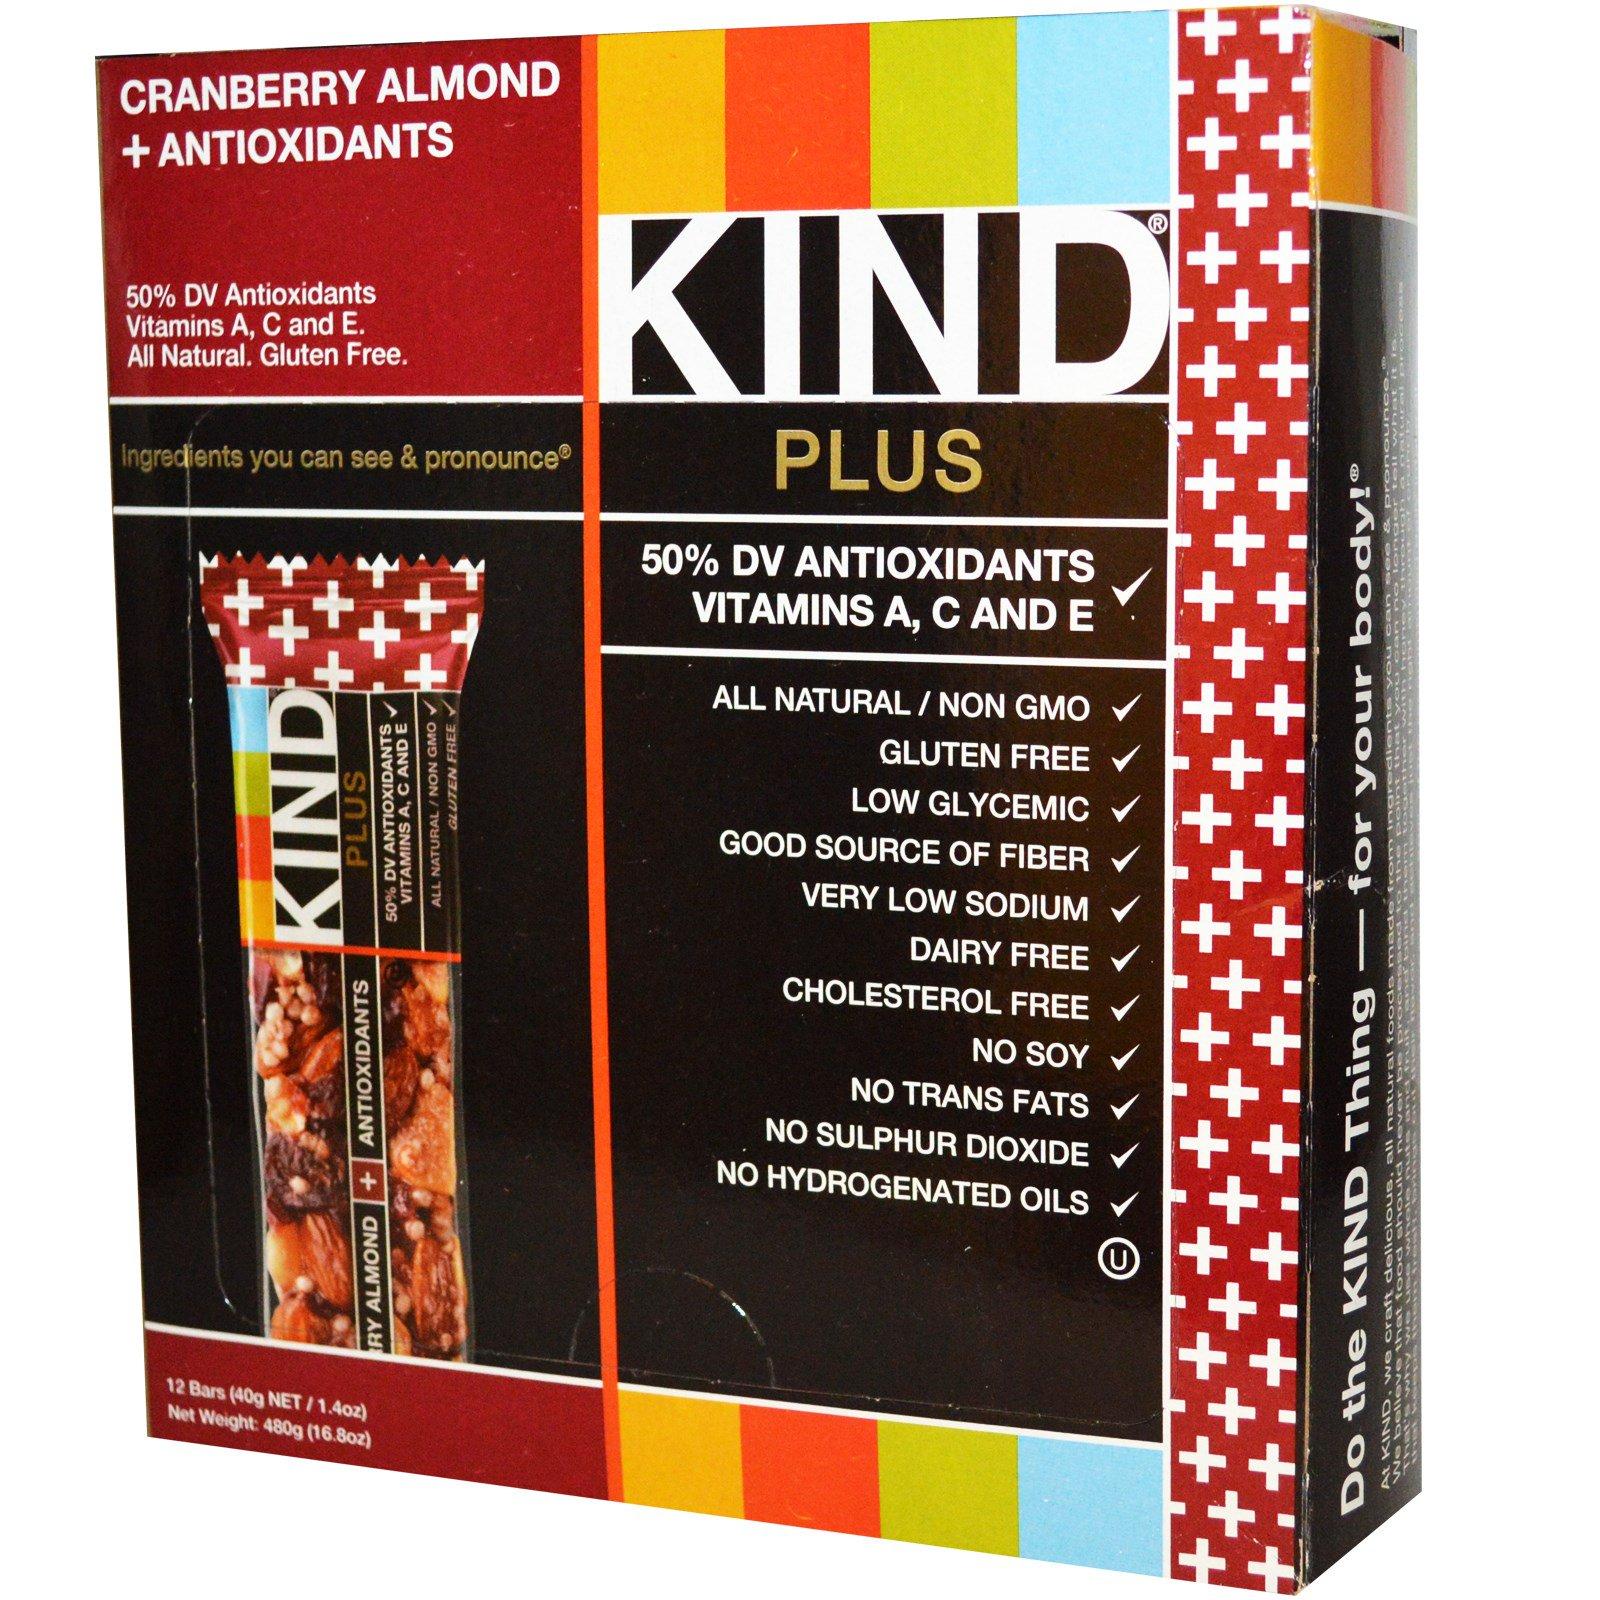 KIND Bars, Kind Plus, батончики с клюквой, миндалем и антиоксидантами, 12 батончиков по 1,4 унции (40 г) каждый